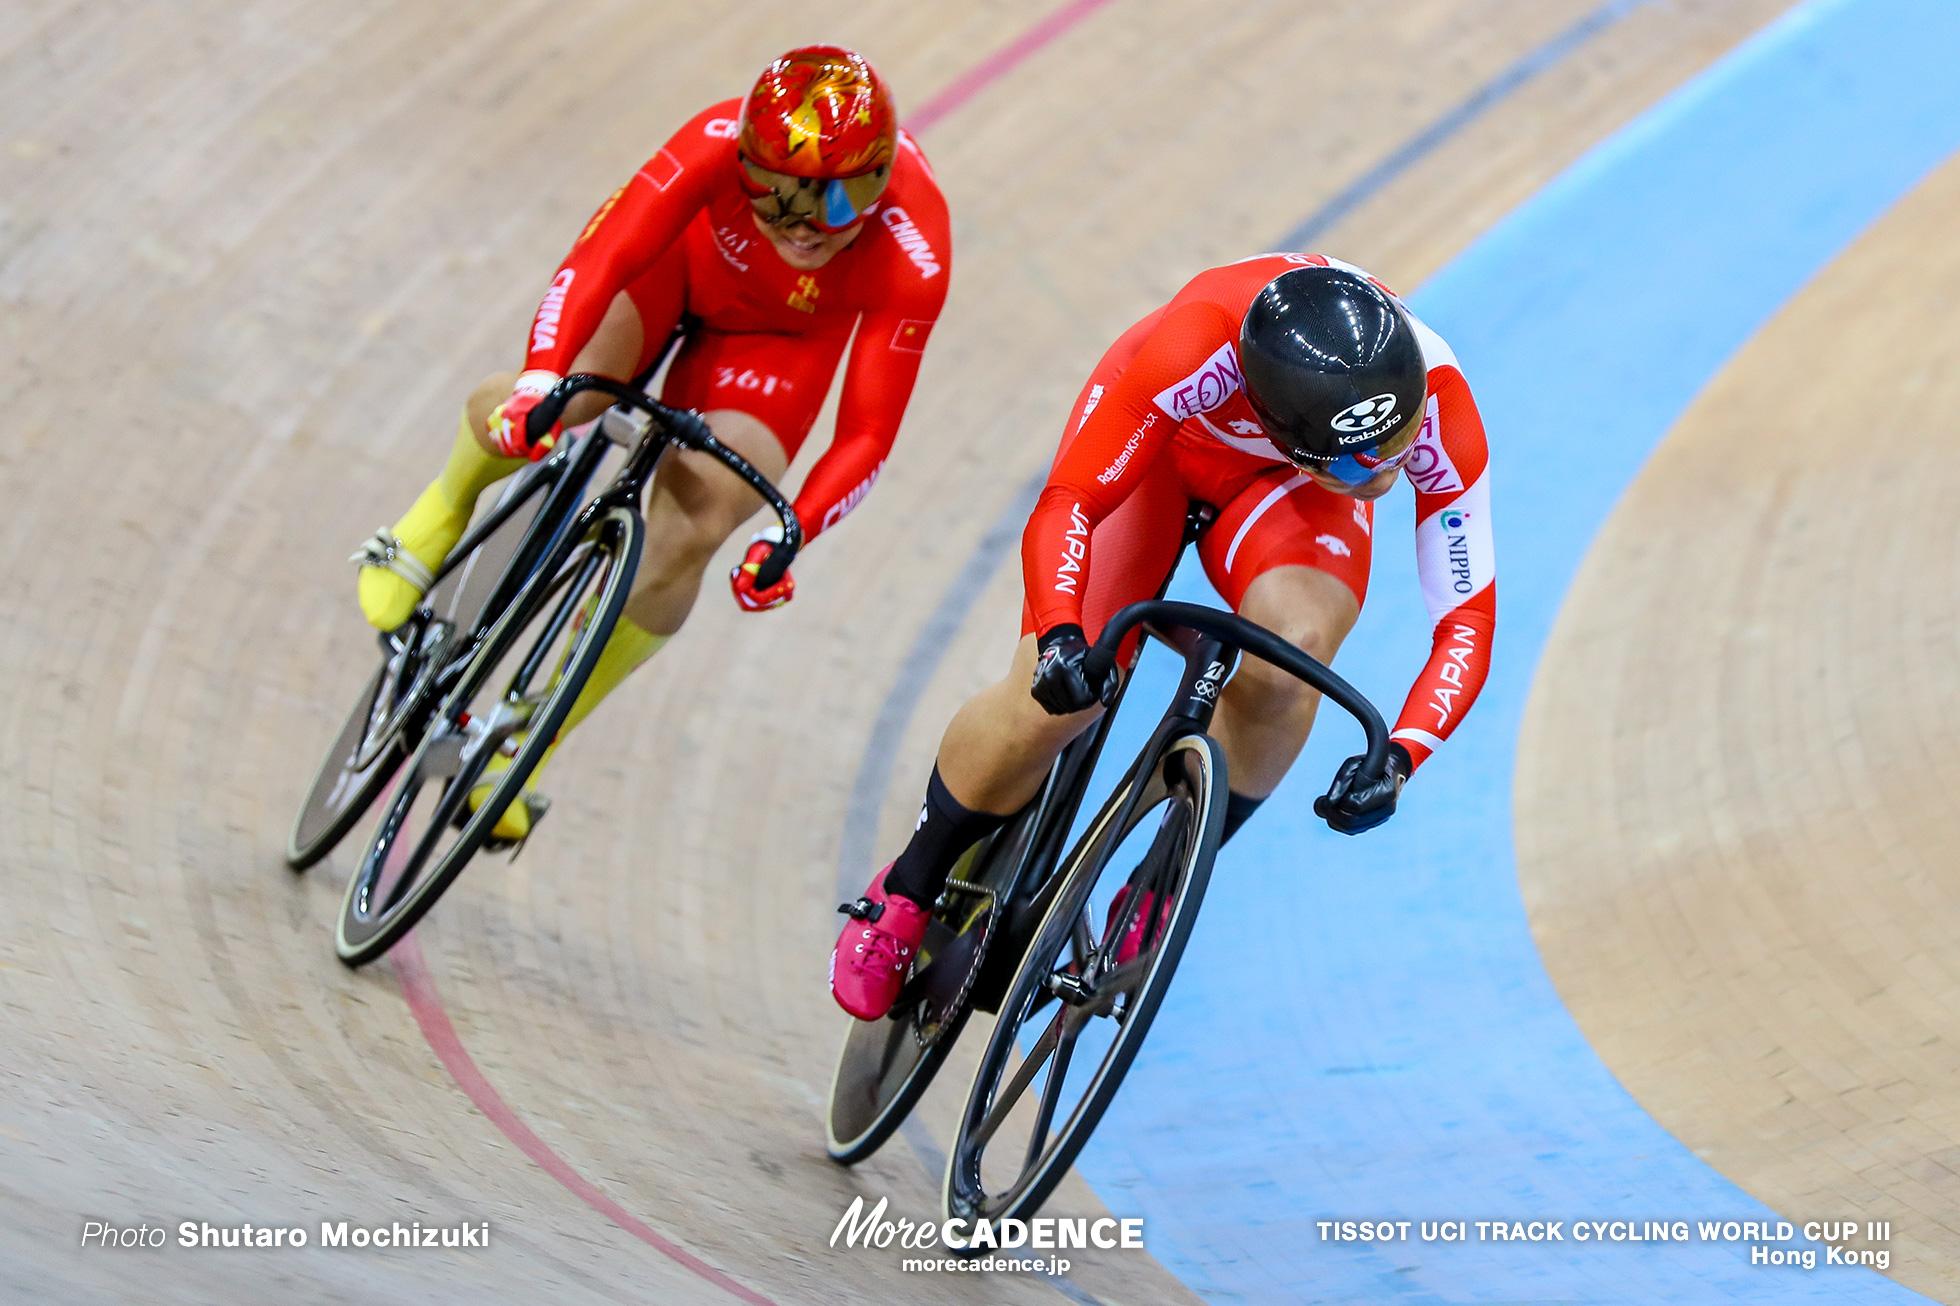 1/16 Finals / Women's Sprint / TISSOT UCI TRACK CYCLING WORLD CUP III, Hong Kong, 太田りゆ LIN Junhong